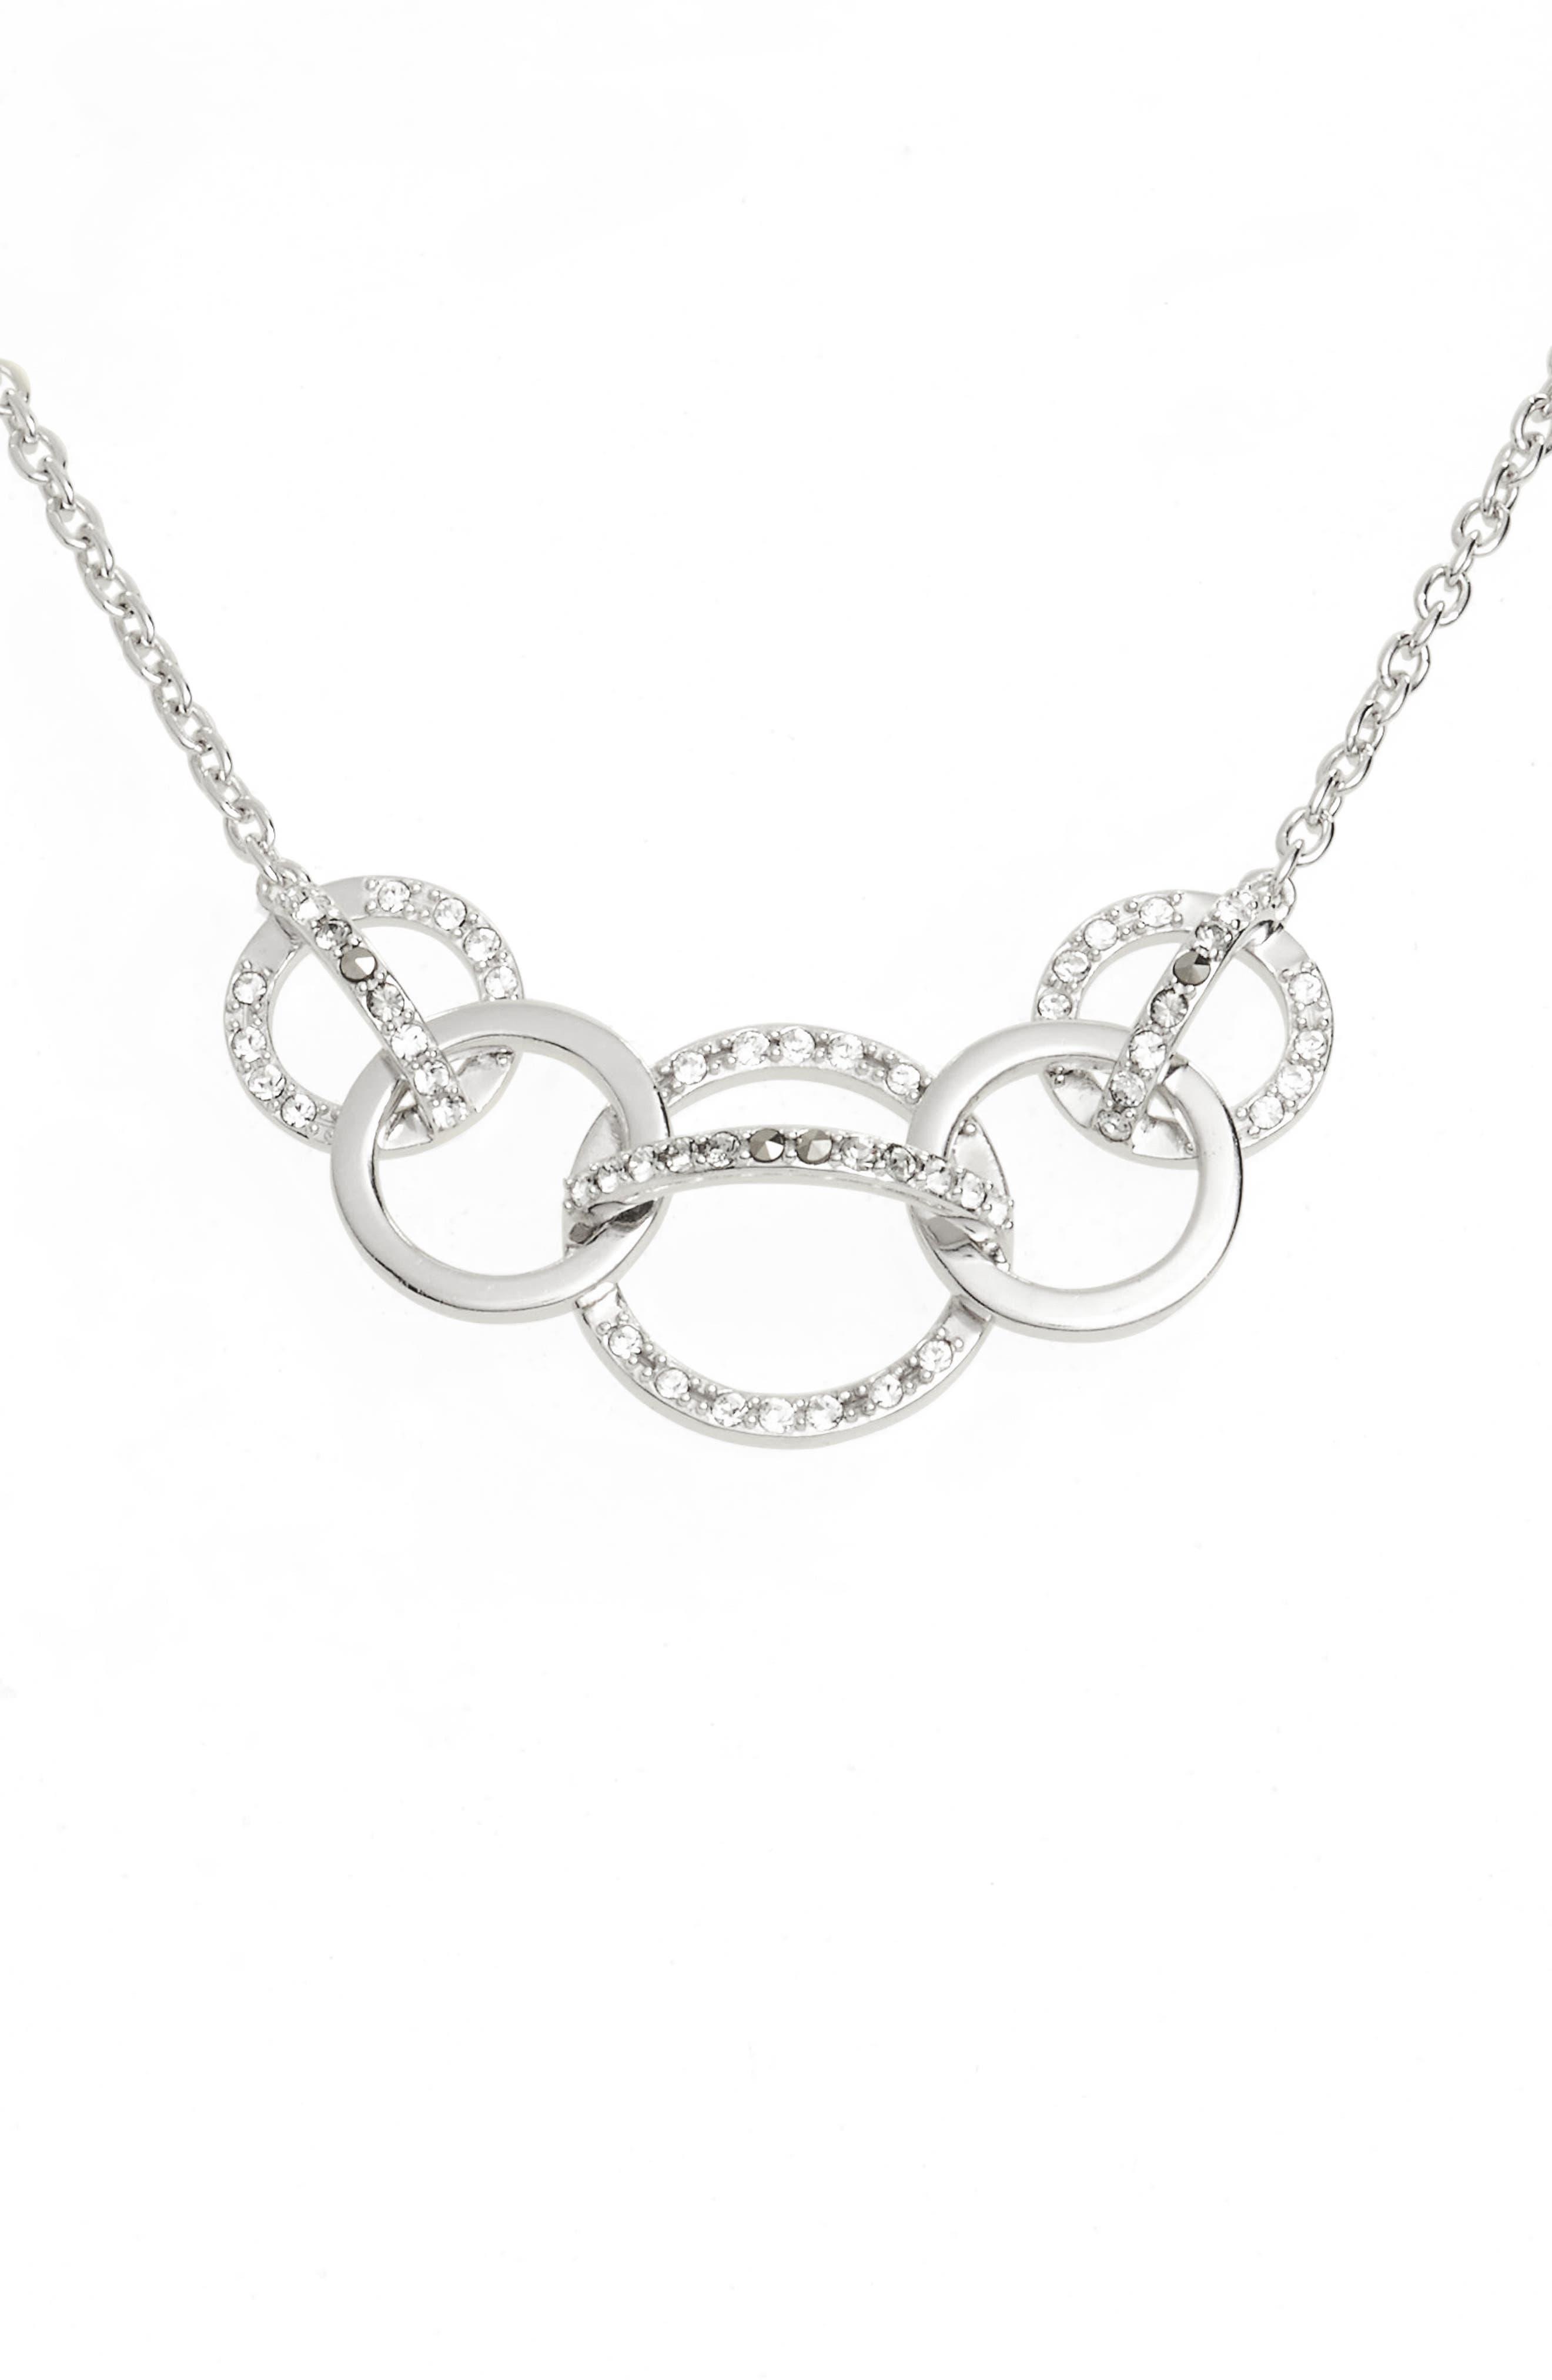 Silver Sparkle Crystal Collar Necklace,                             Main thumbnail 1, color,                             040